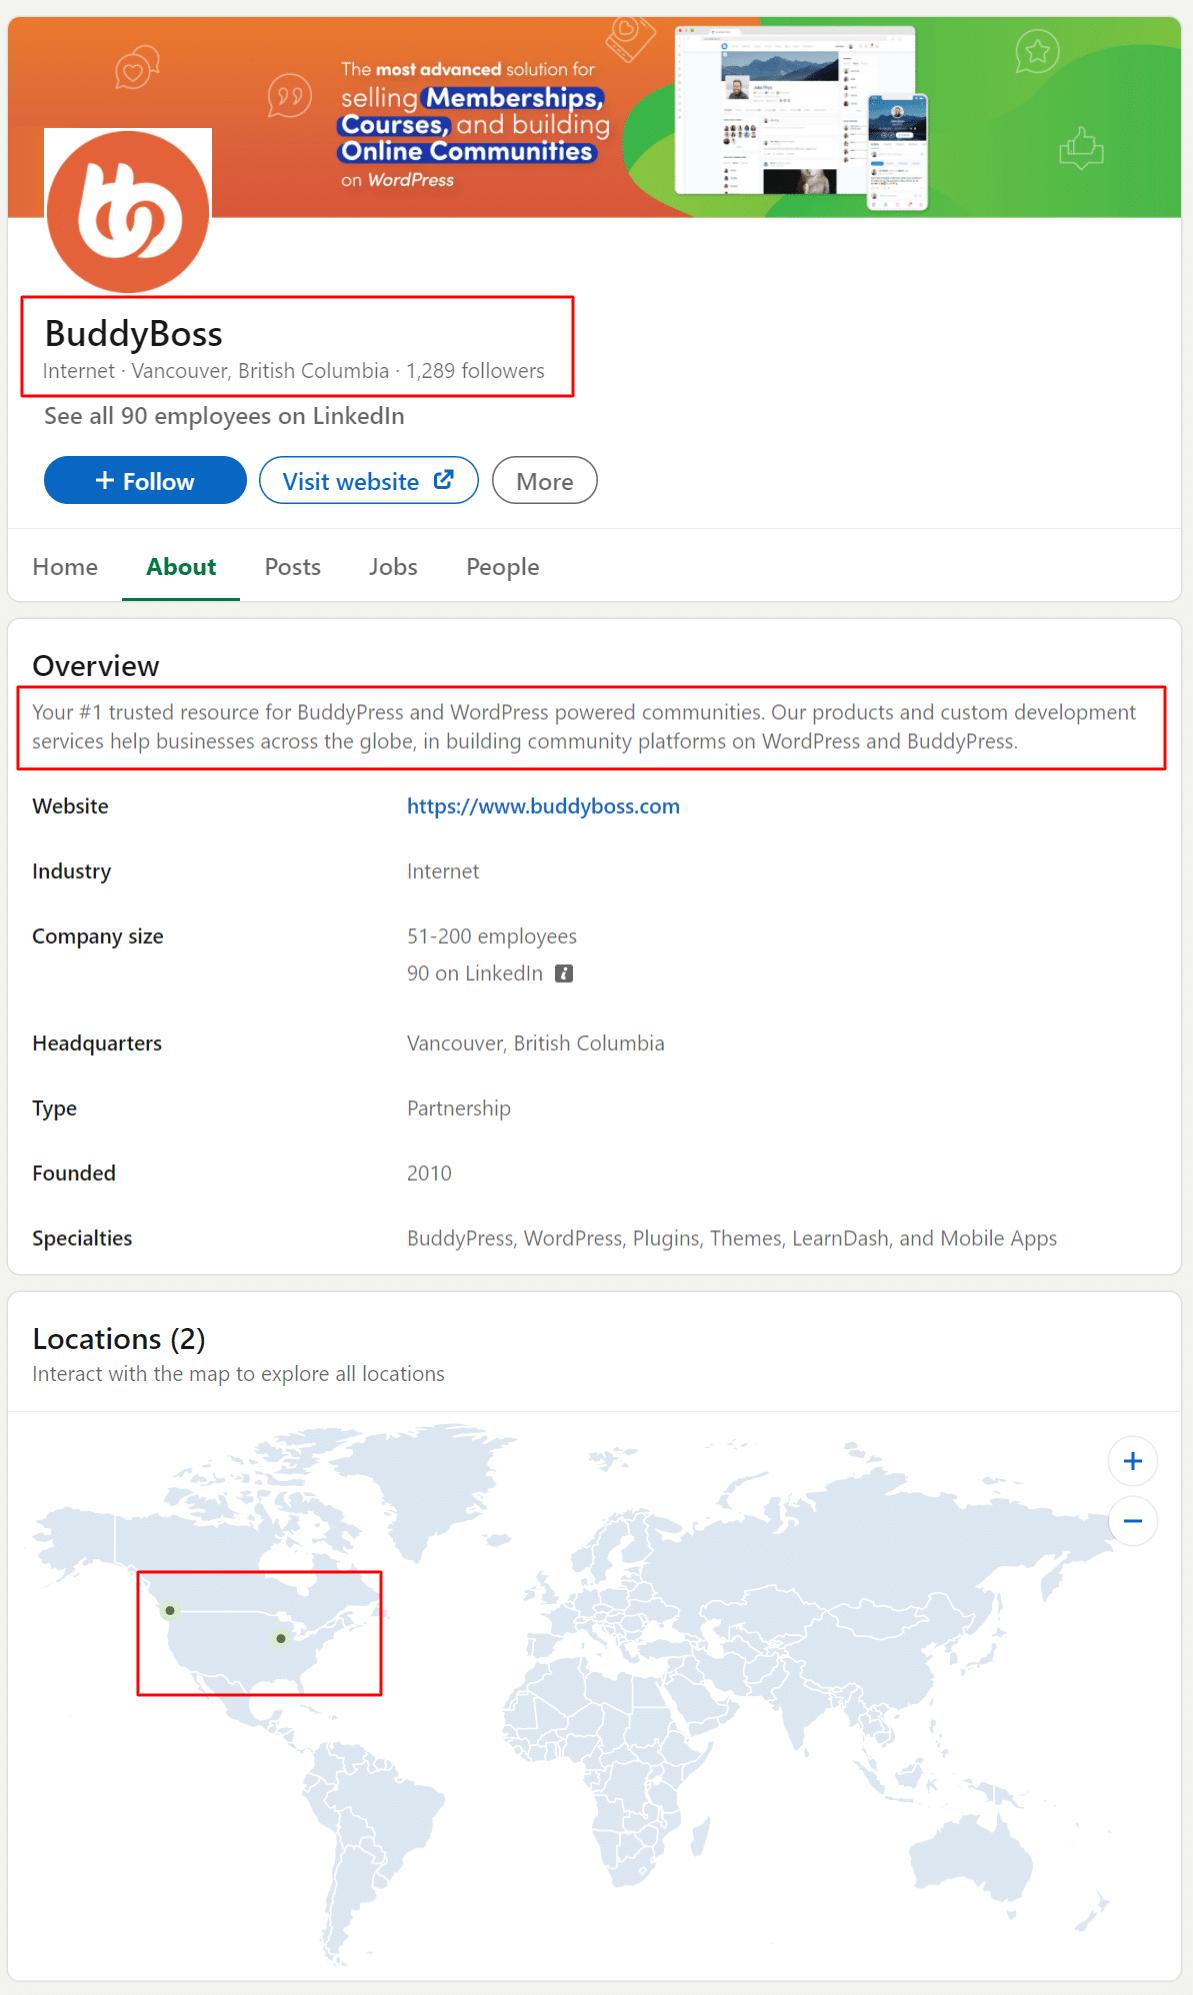 BuddyBoss-About-LinkedIn